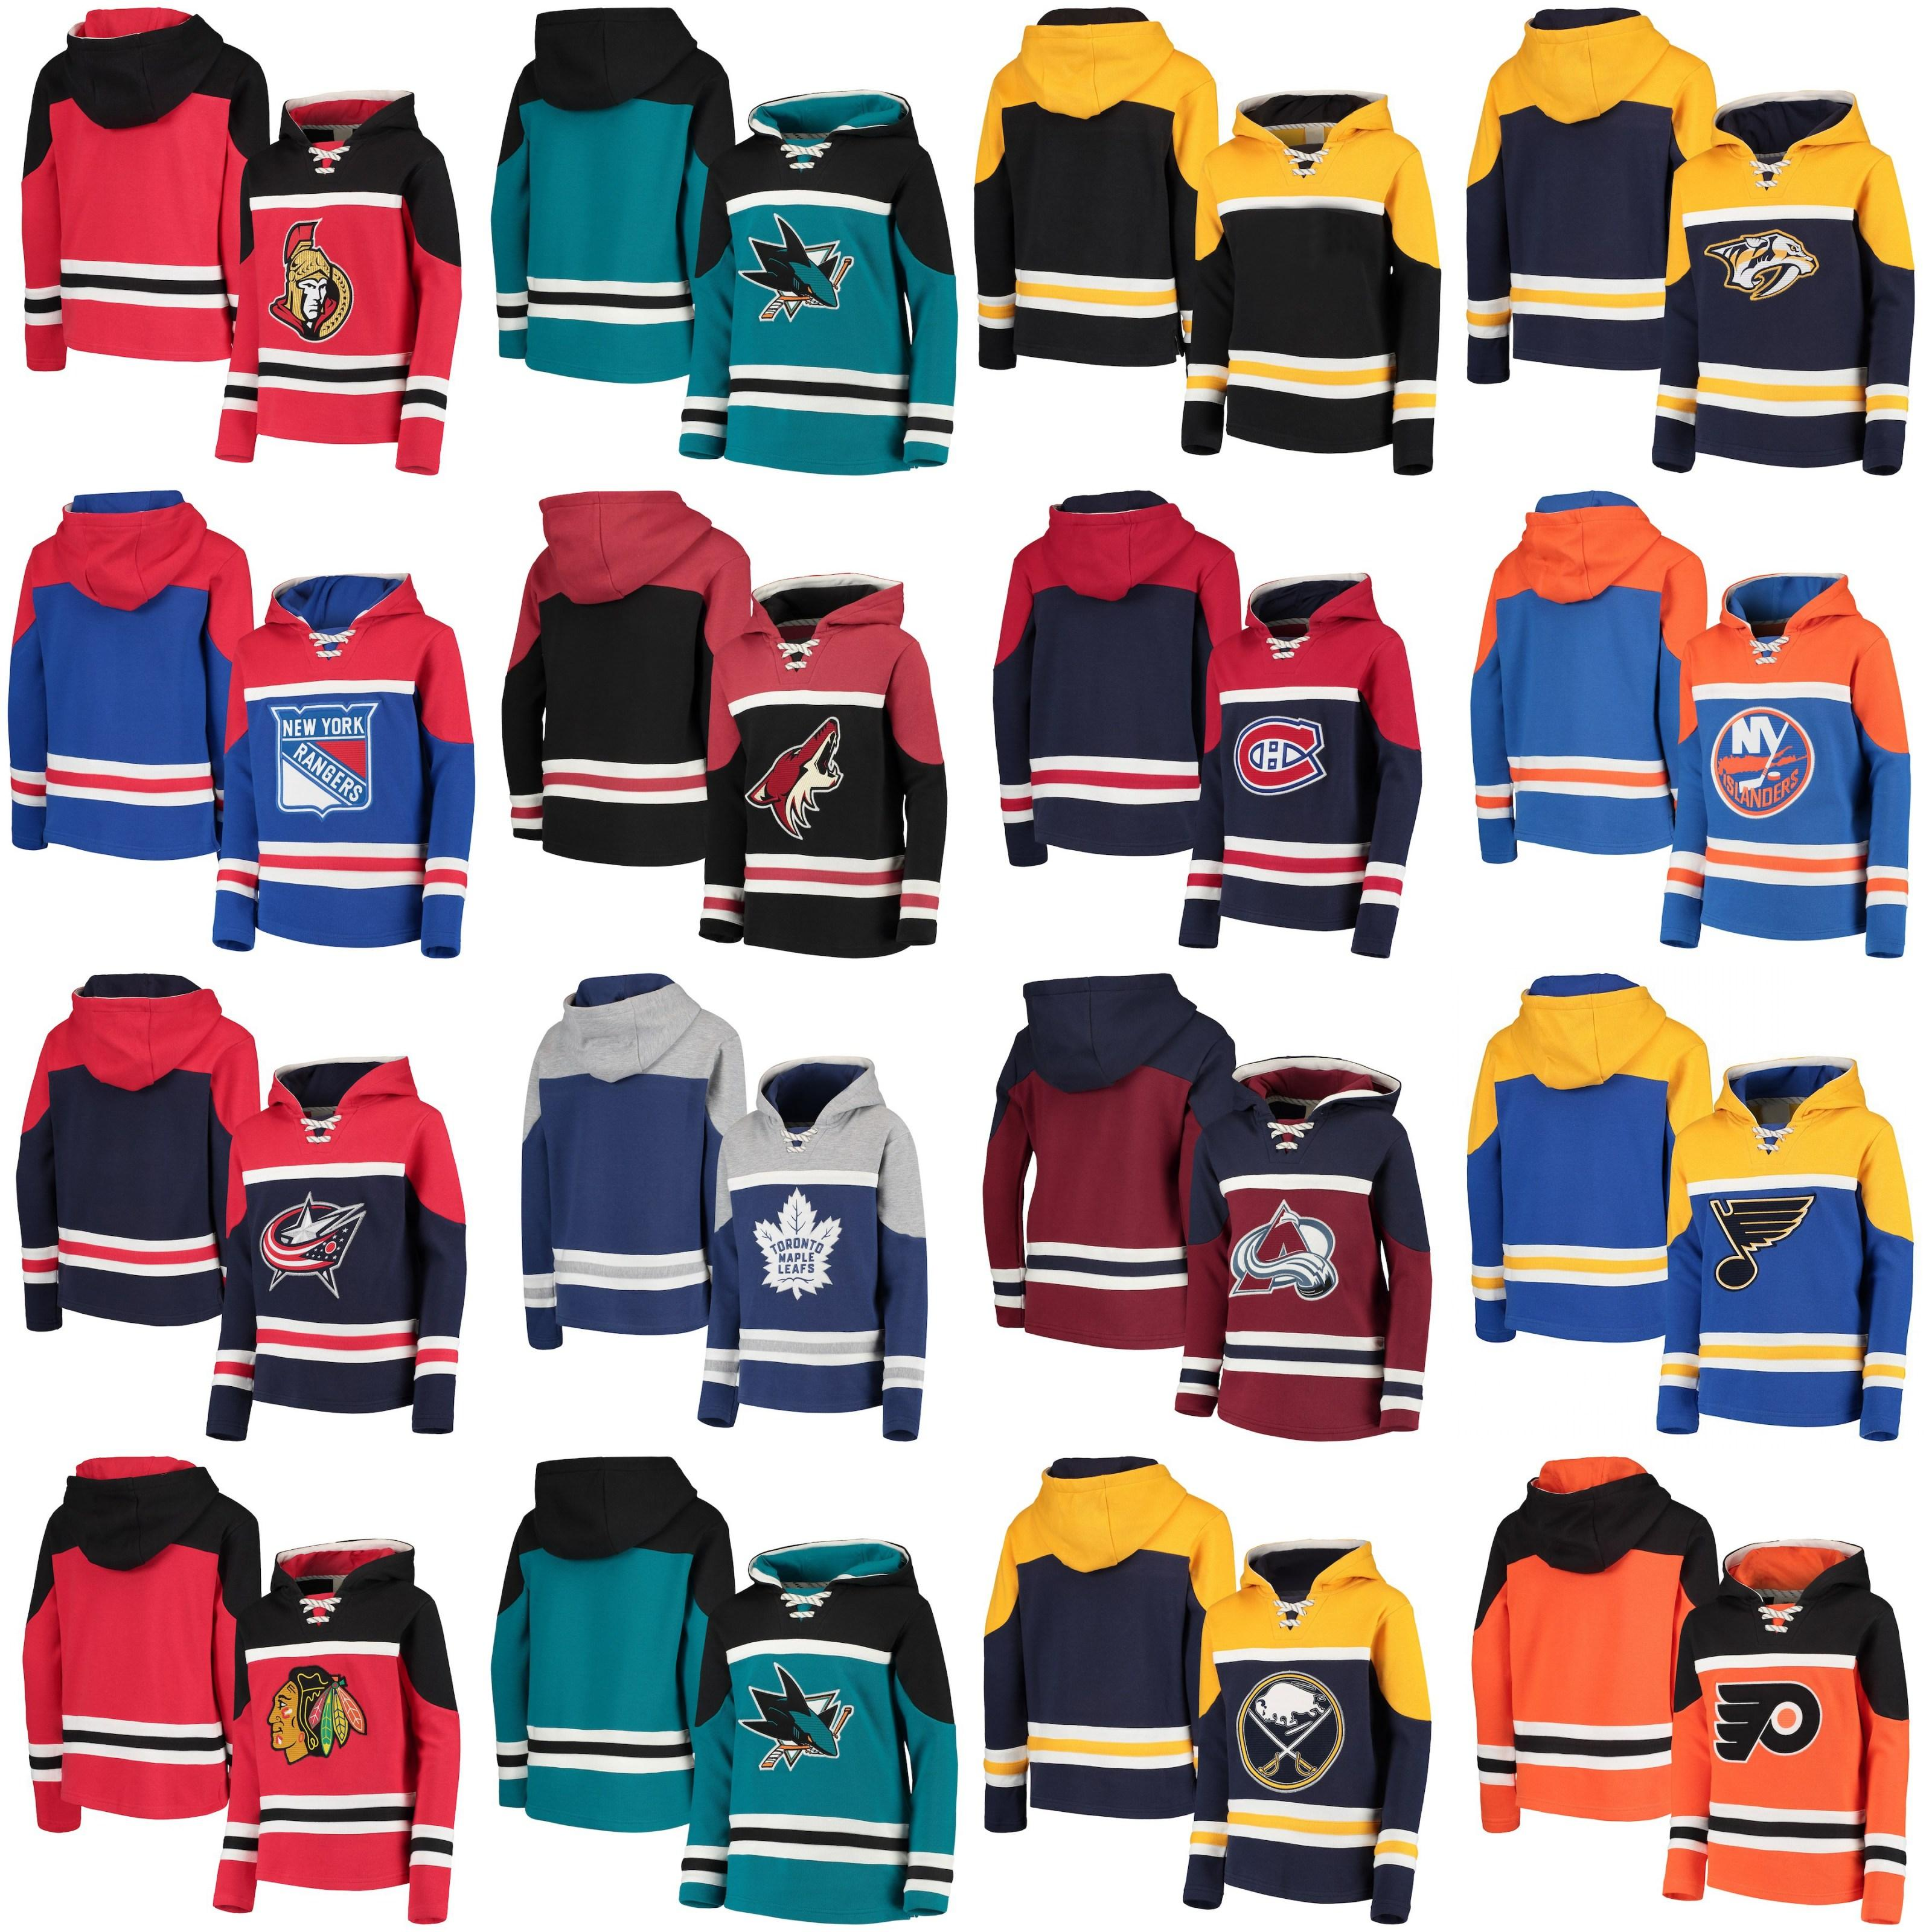 5d9058b6c Chicago Blackhawks Hoodies Jerseys New Anaheim Ducks Toronto Maple Leafs  Nashville Predators Montreal Canadiens Vancouver Canucks Wholesale Hockey  Jerseys ...